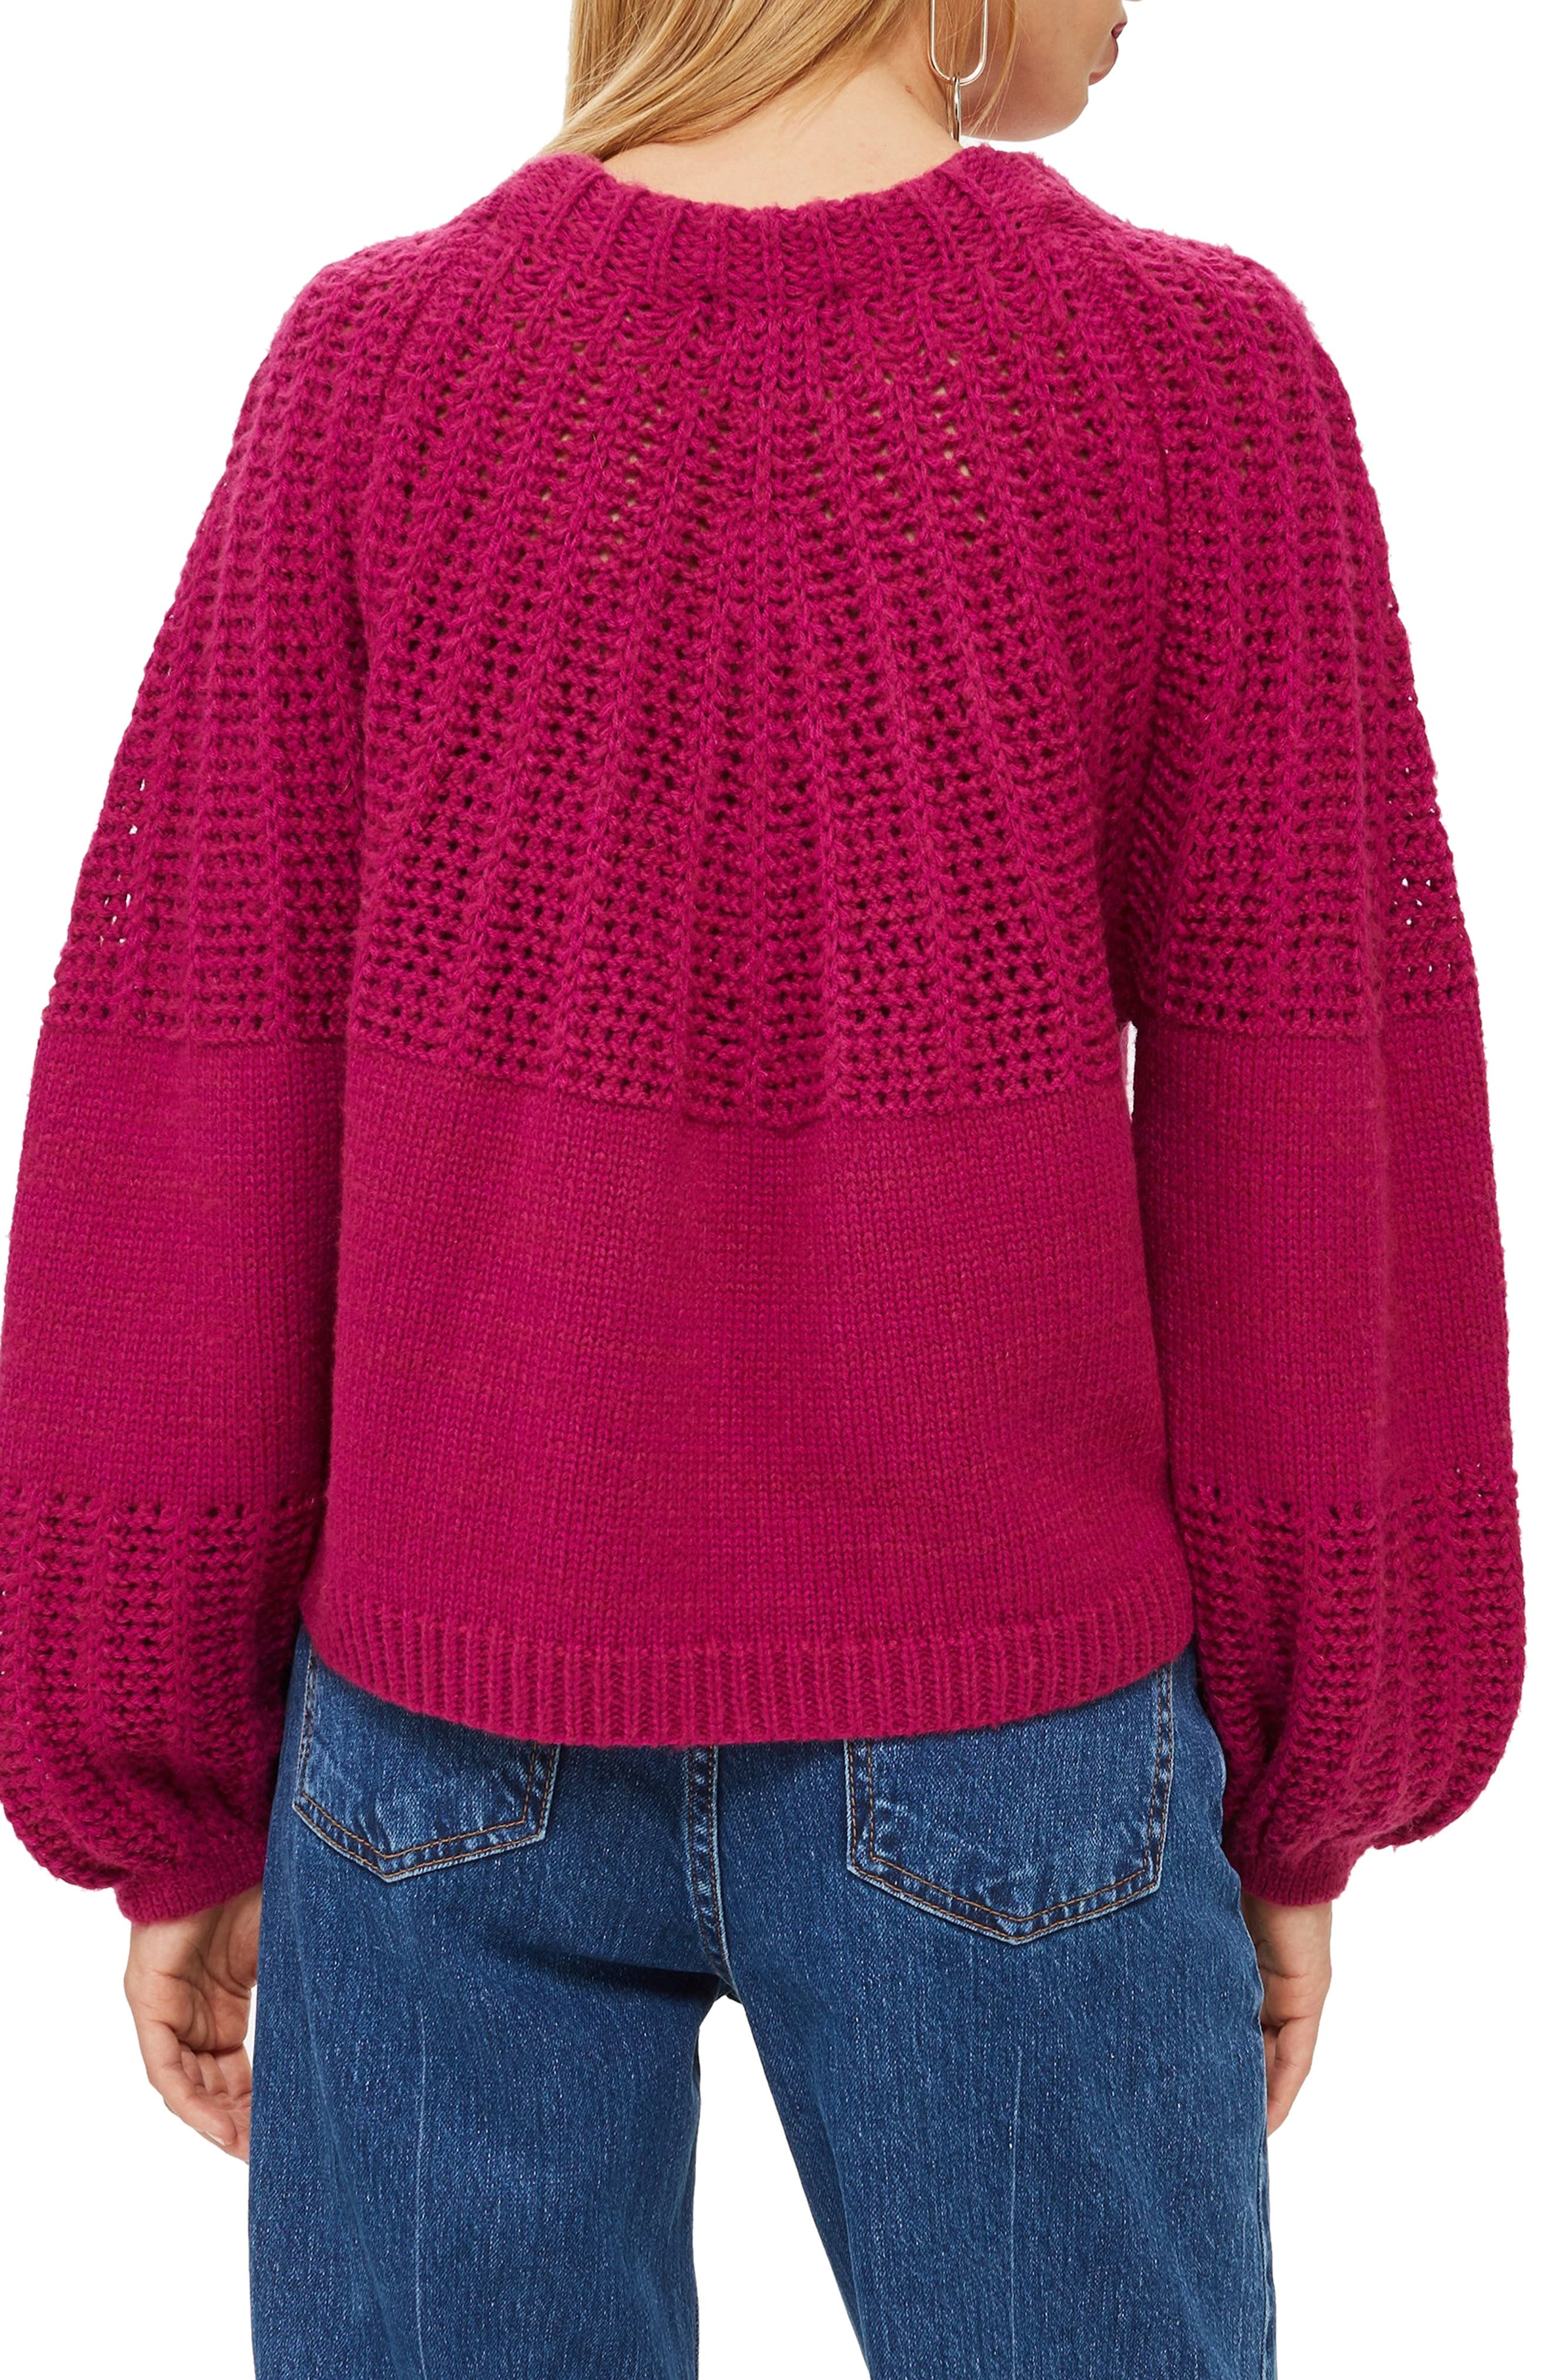 Pointelle Ball Sleeve Sweater,                             Alternate thumbnail 2, color,                             500